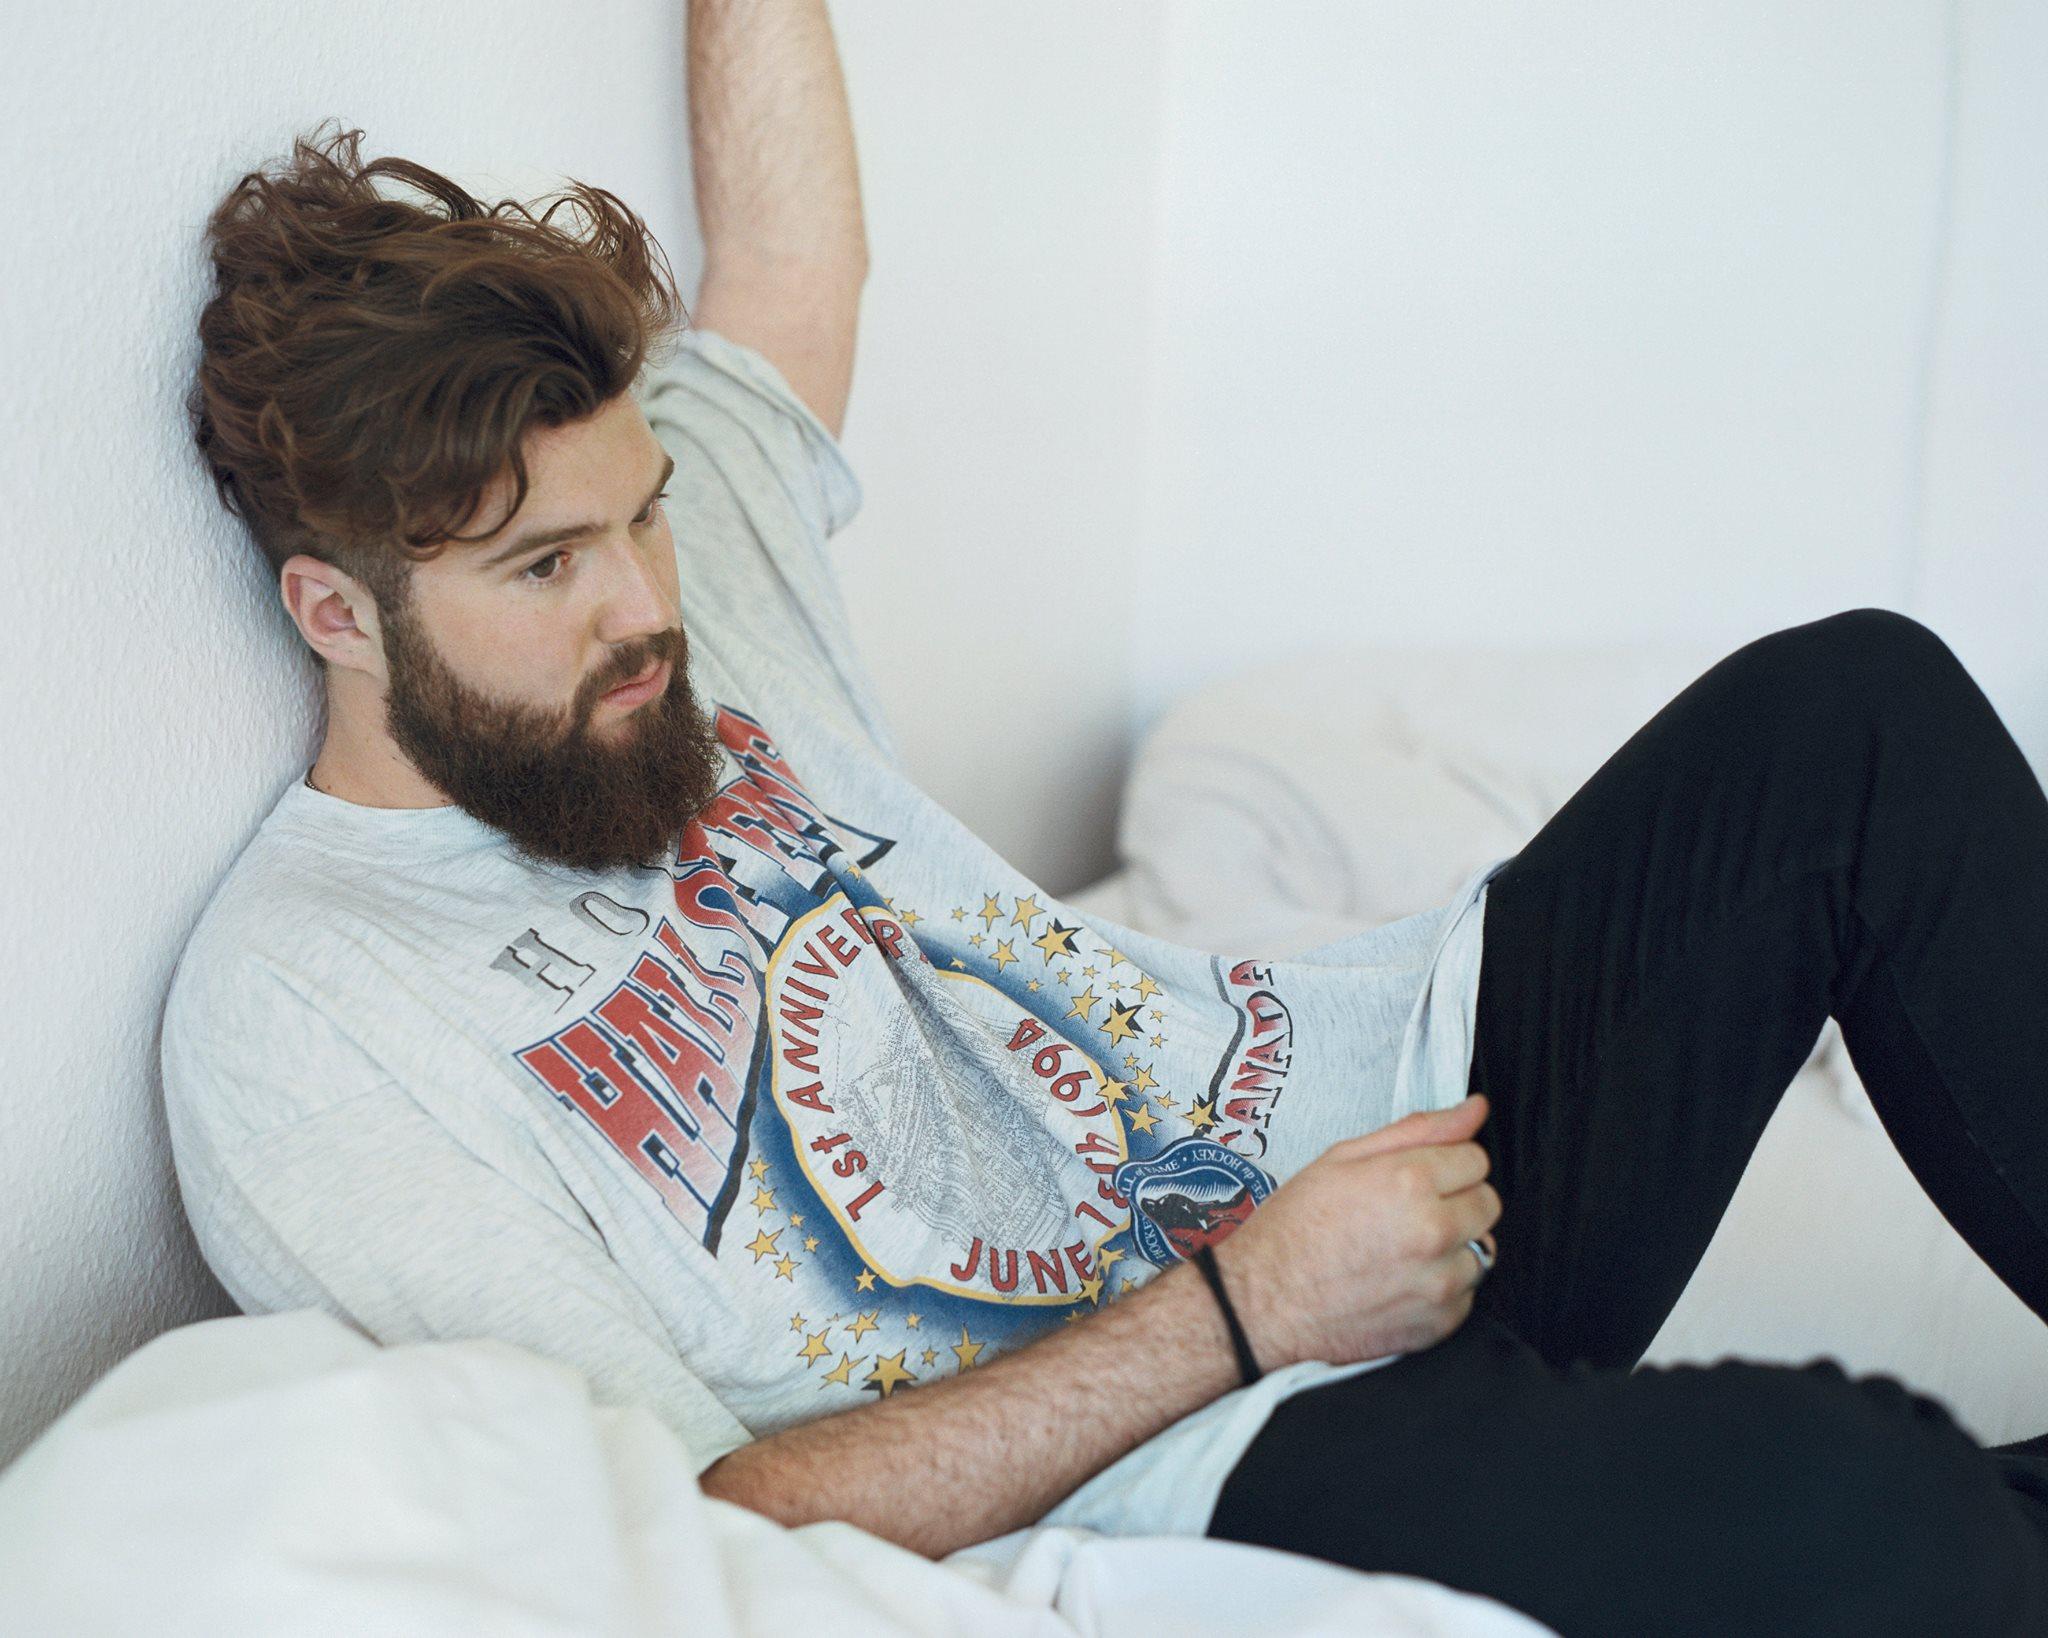 Prins Thomas + Lucas Nord Remixes appear in Trenda: New Nordic Pop!